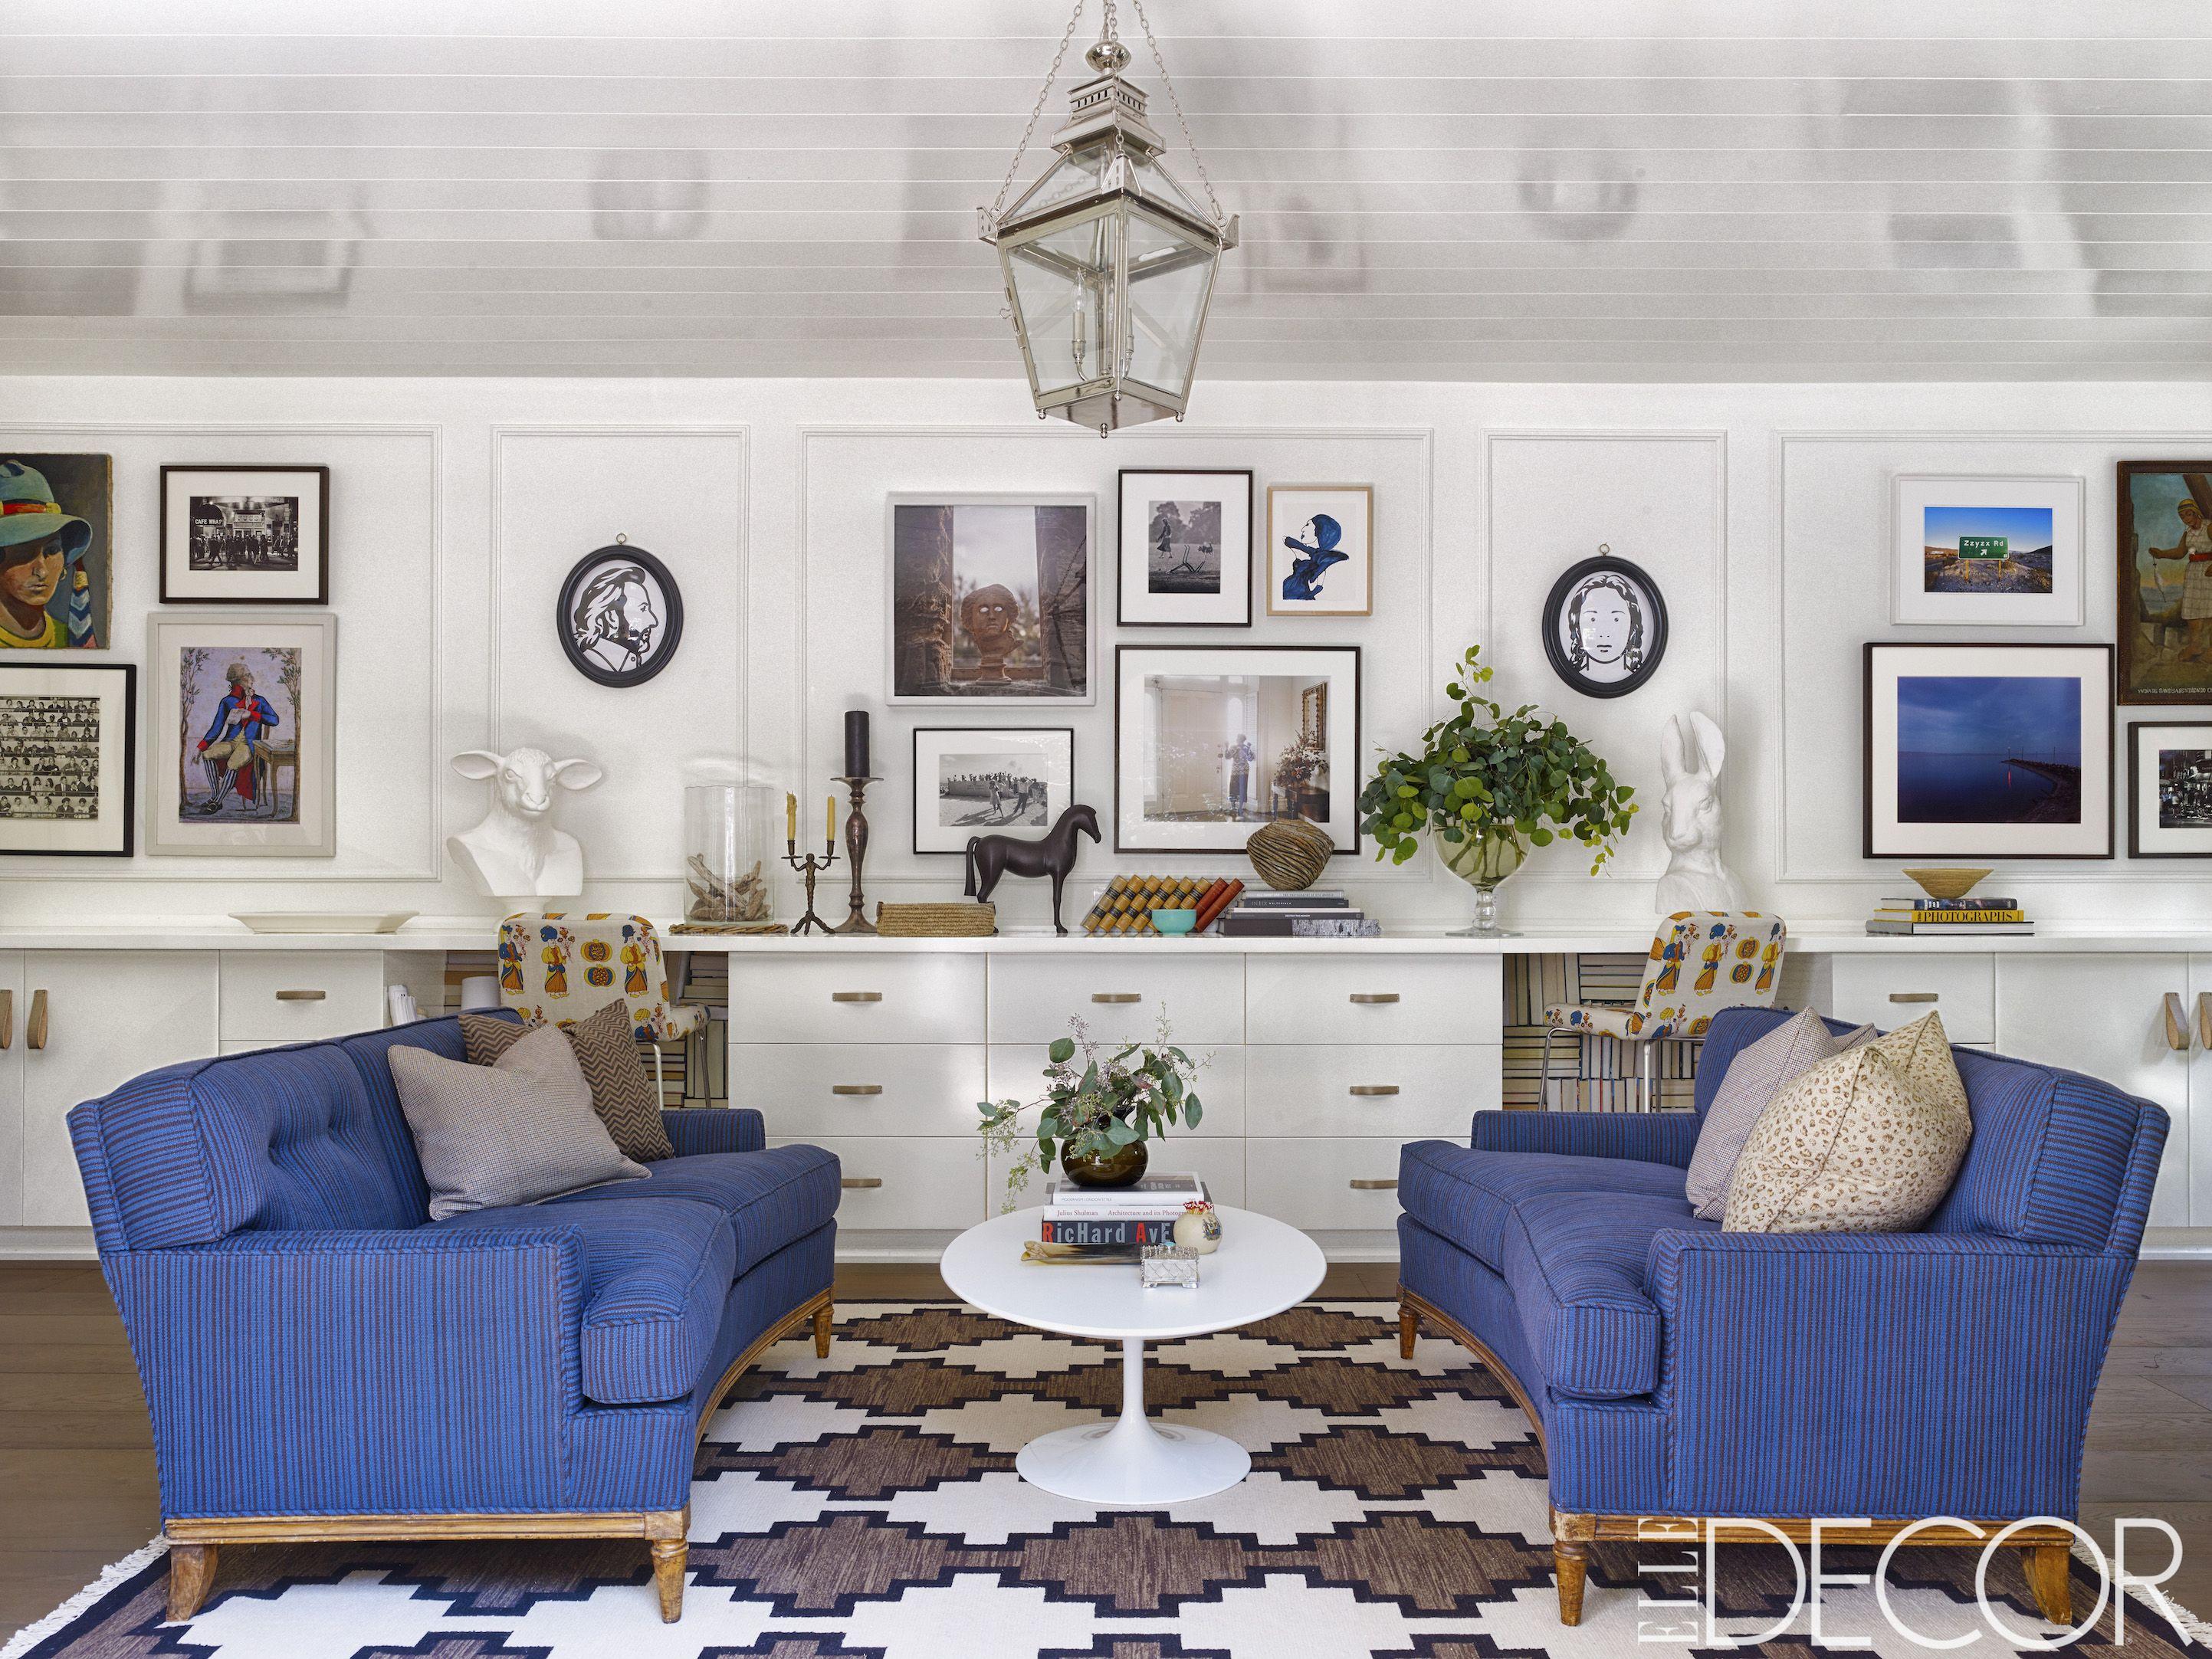 50 Gorgeous Living Room Ideas - Stylish Living Room Design ... on Beautiful Room Decoration  id=29178